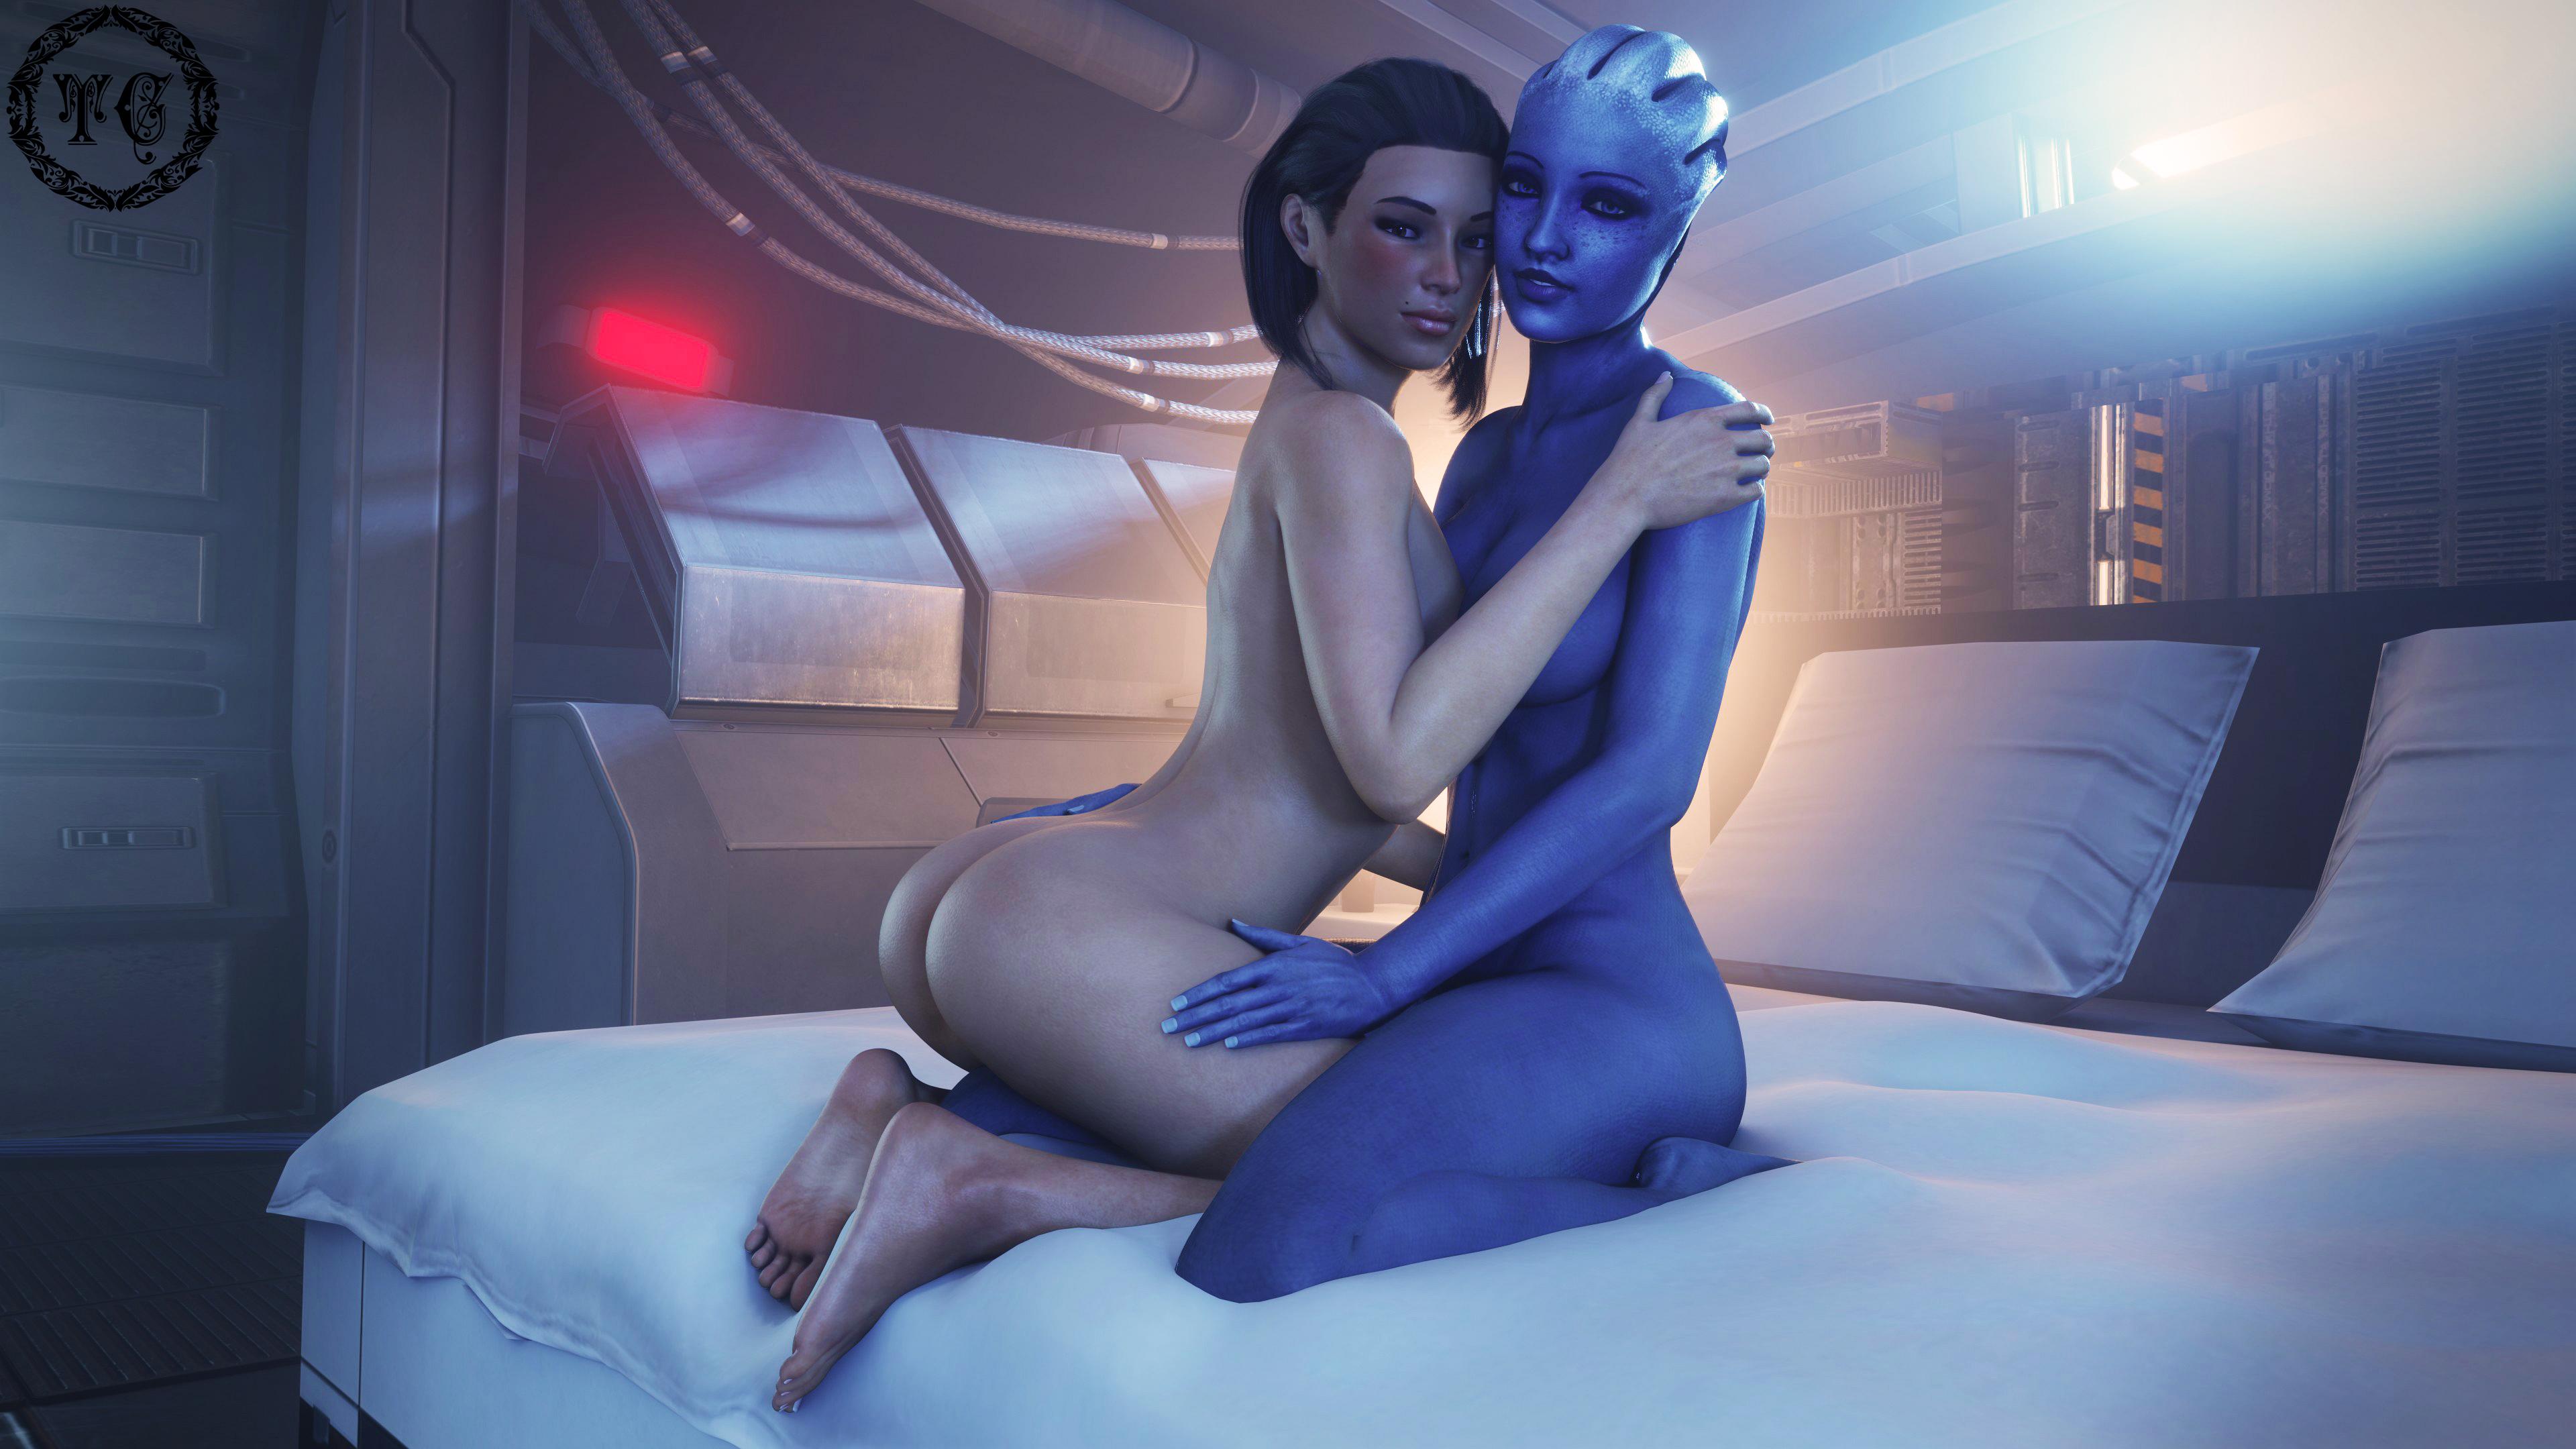 Eva & Liara - Captain's Quarters